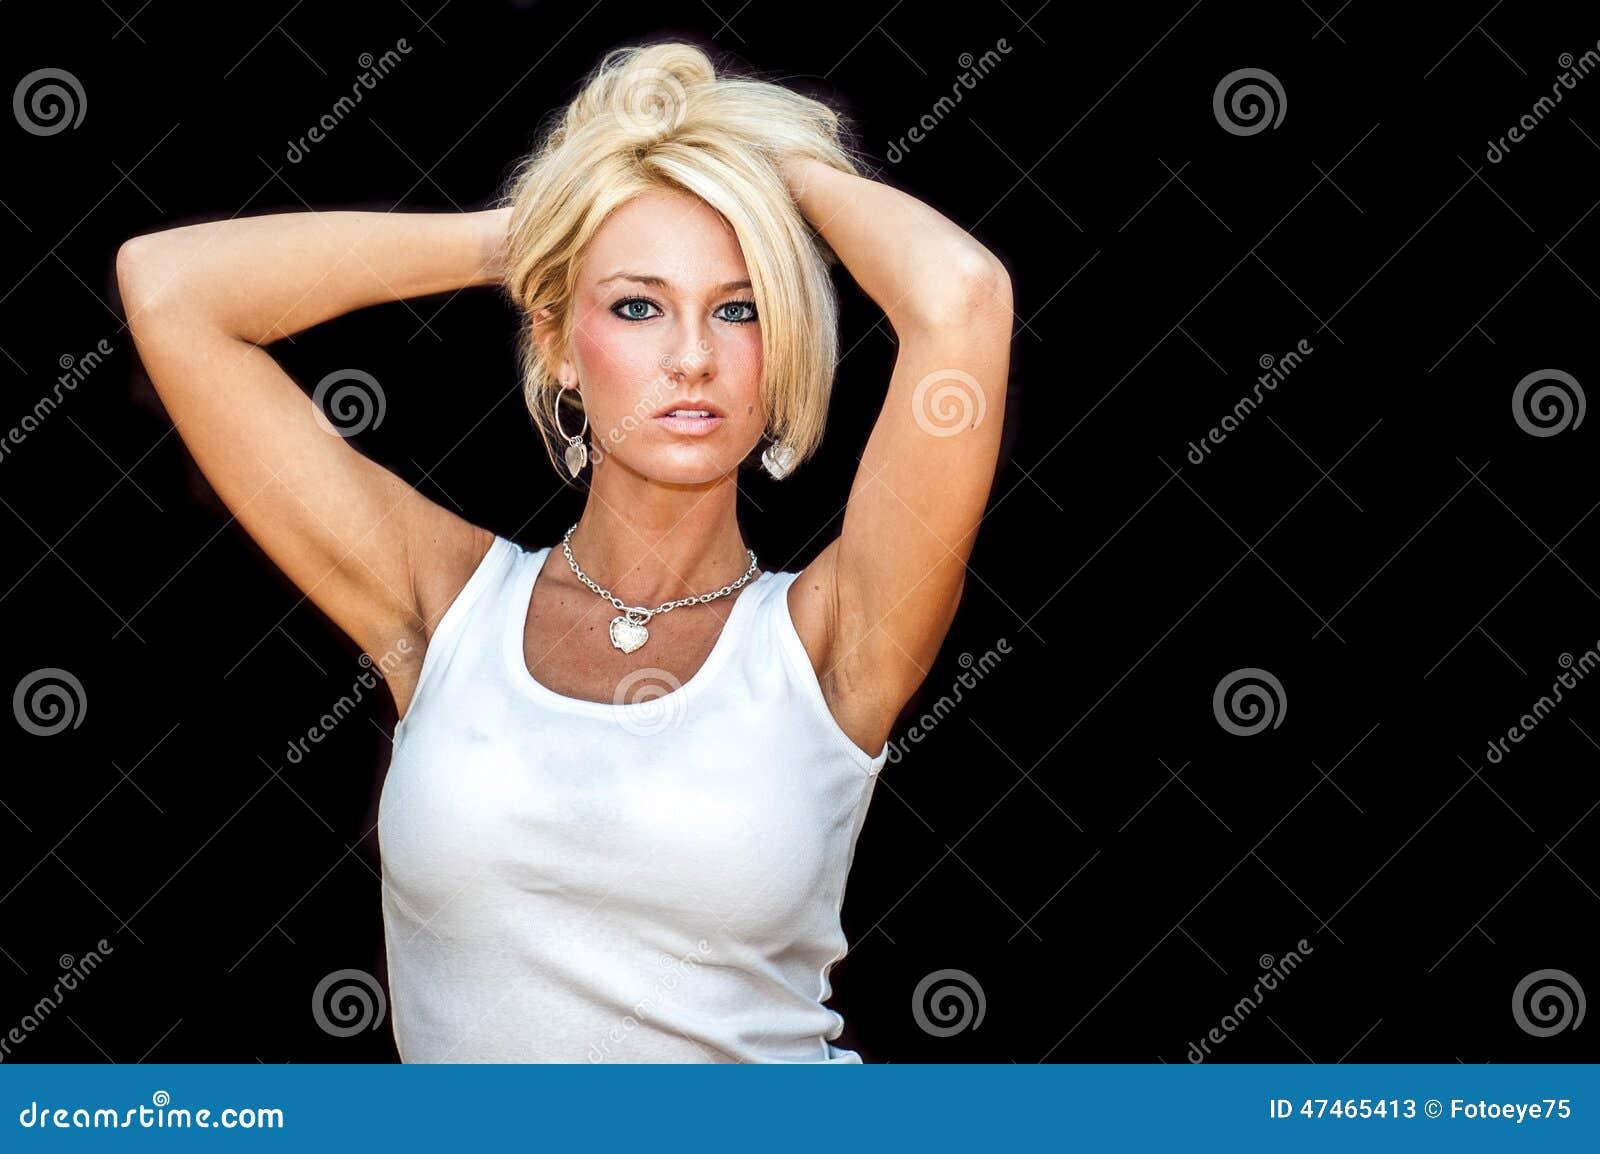 Strictly looking Hetro handjob fan club years old girl. I'm